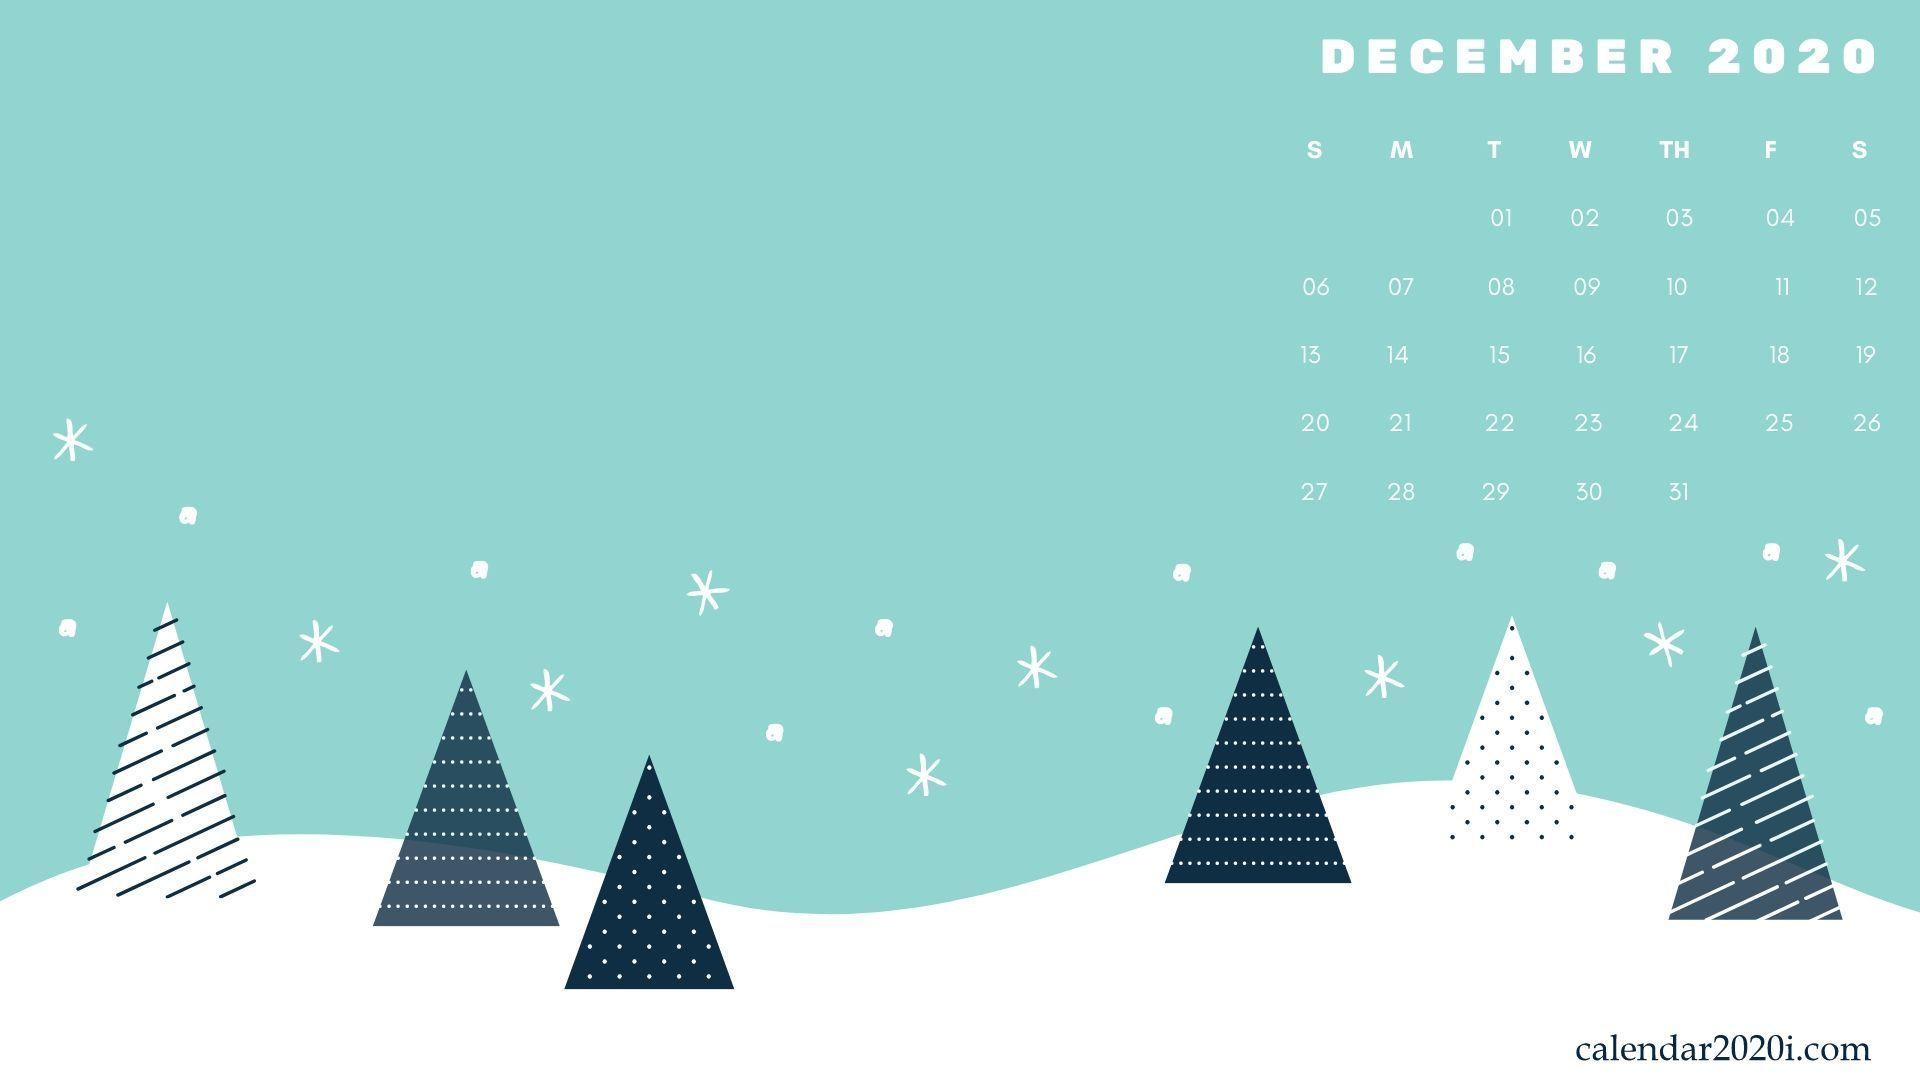 December 2020 Wallpapers 1920x1080